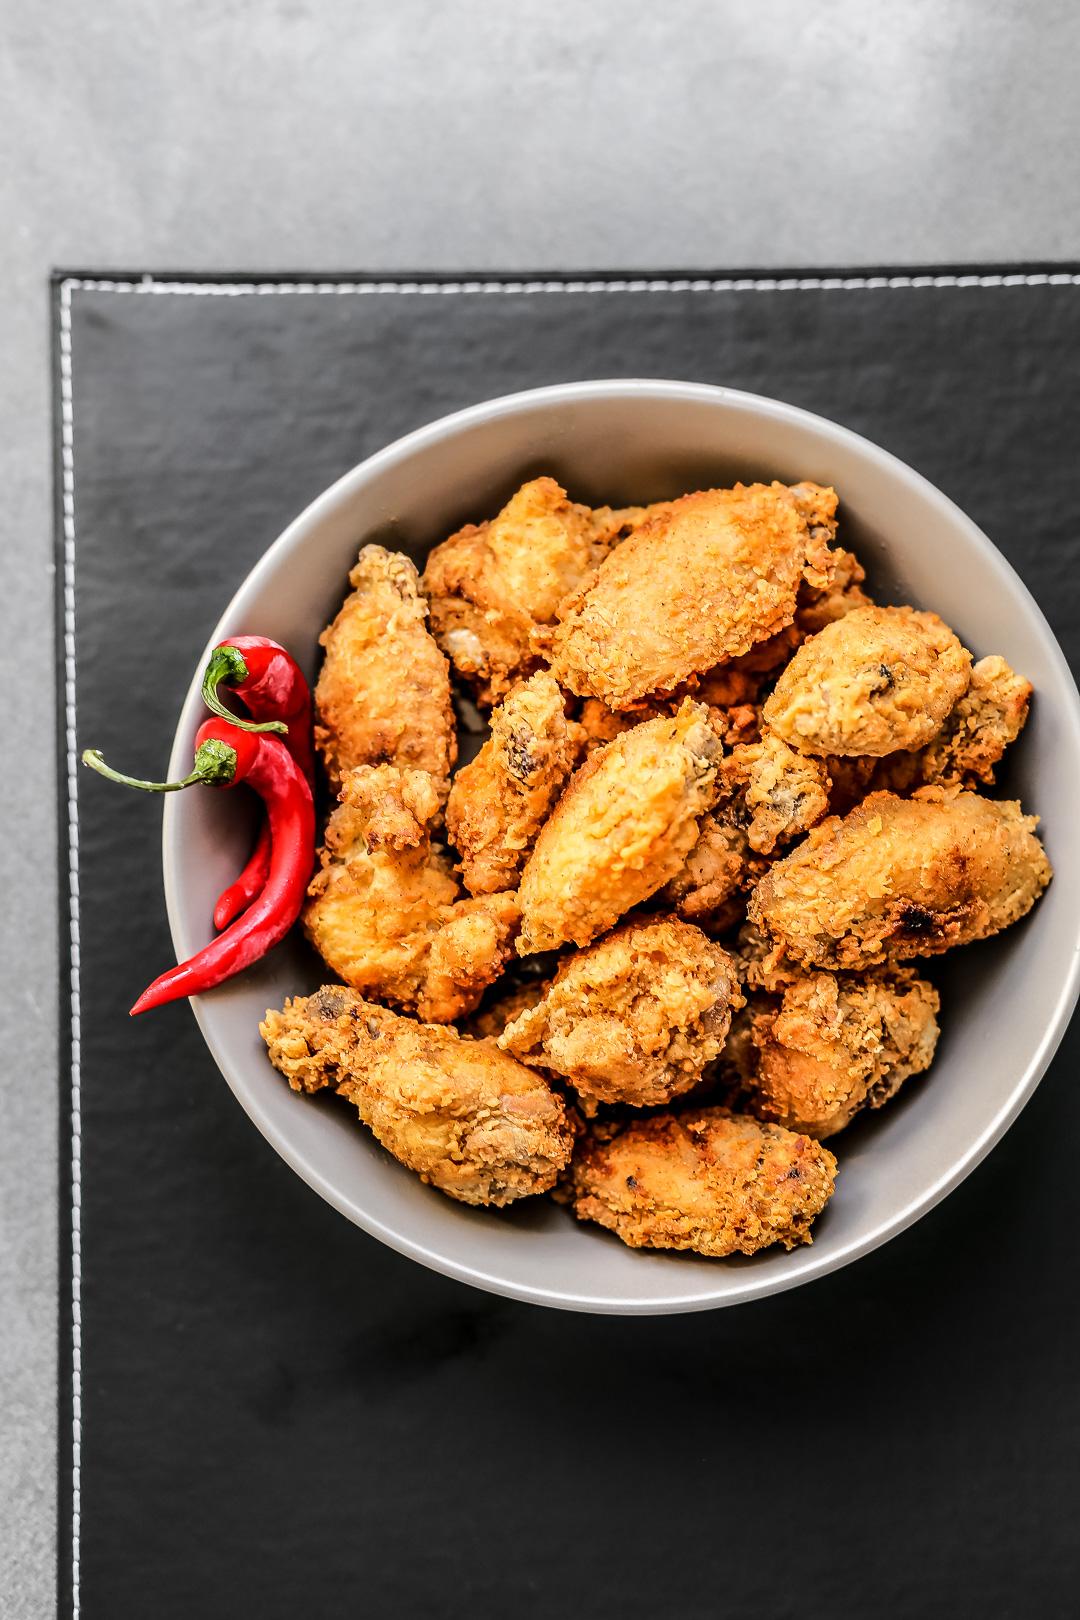 Spicy Fried Chicken Wings Recipe